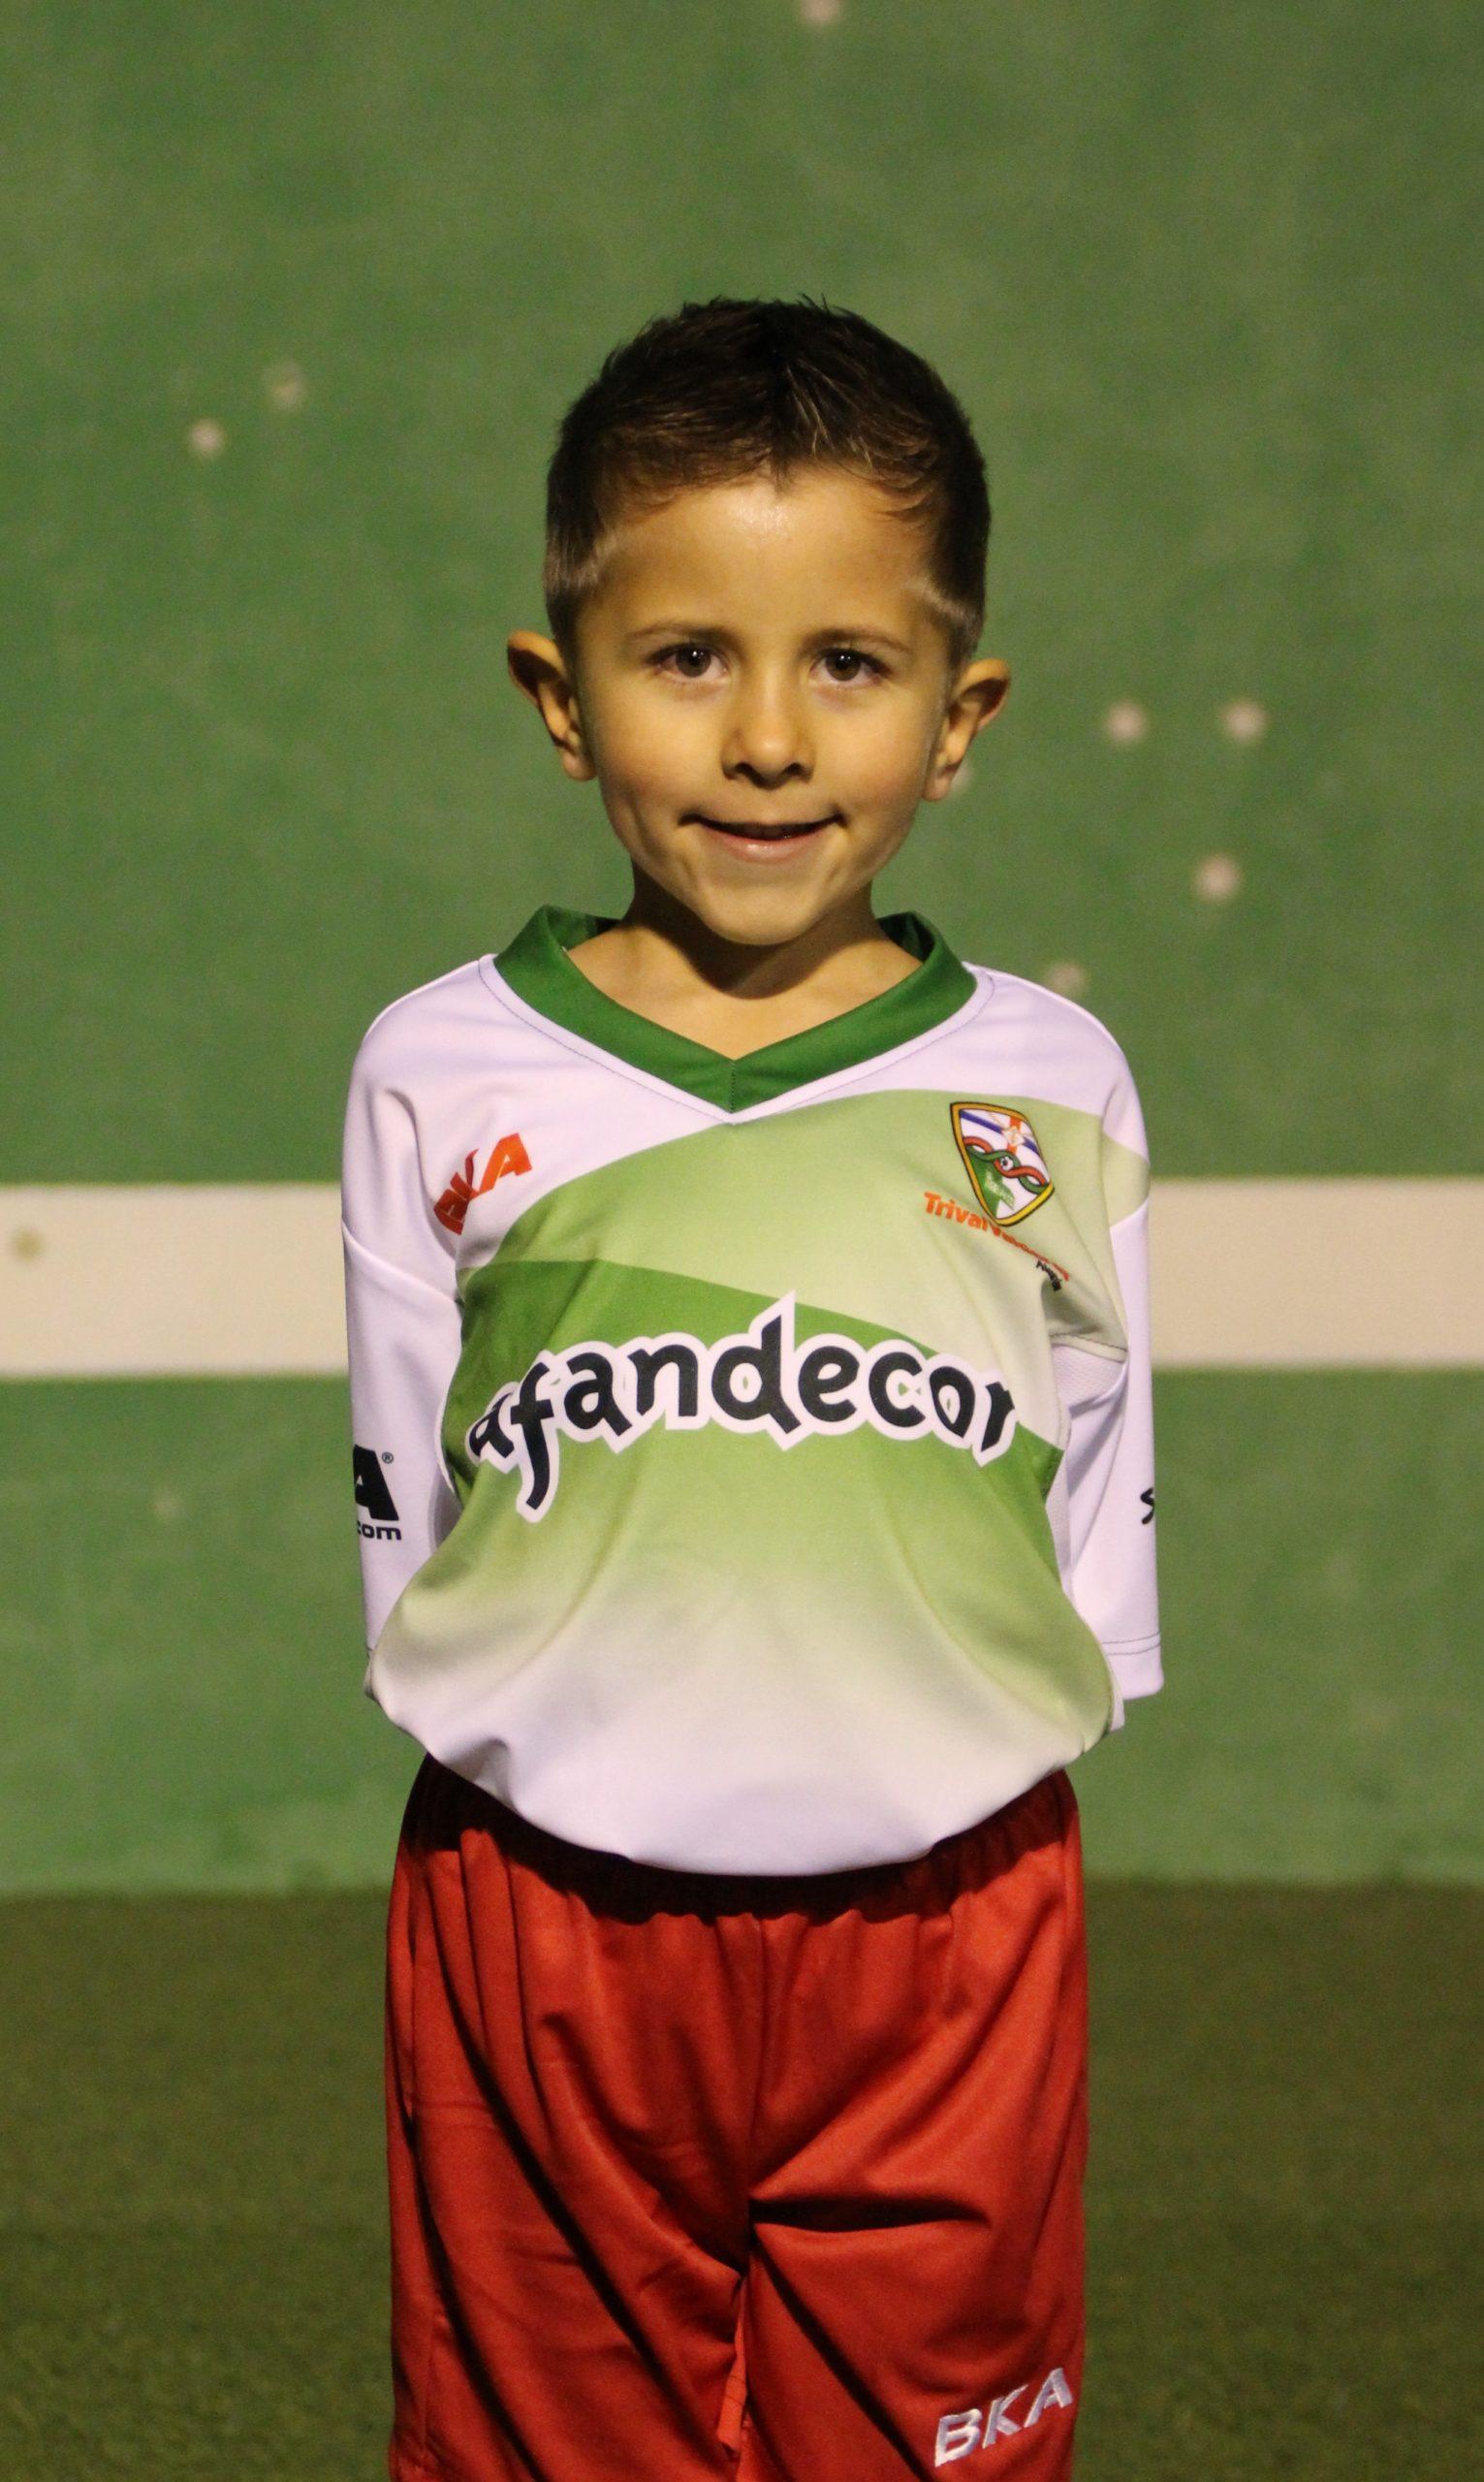 16 Izan Campos García